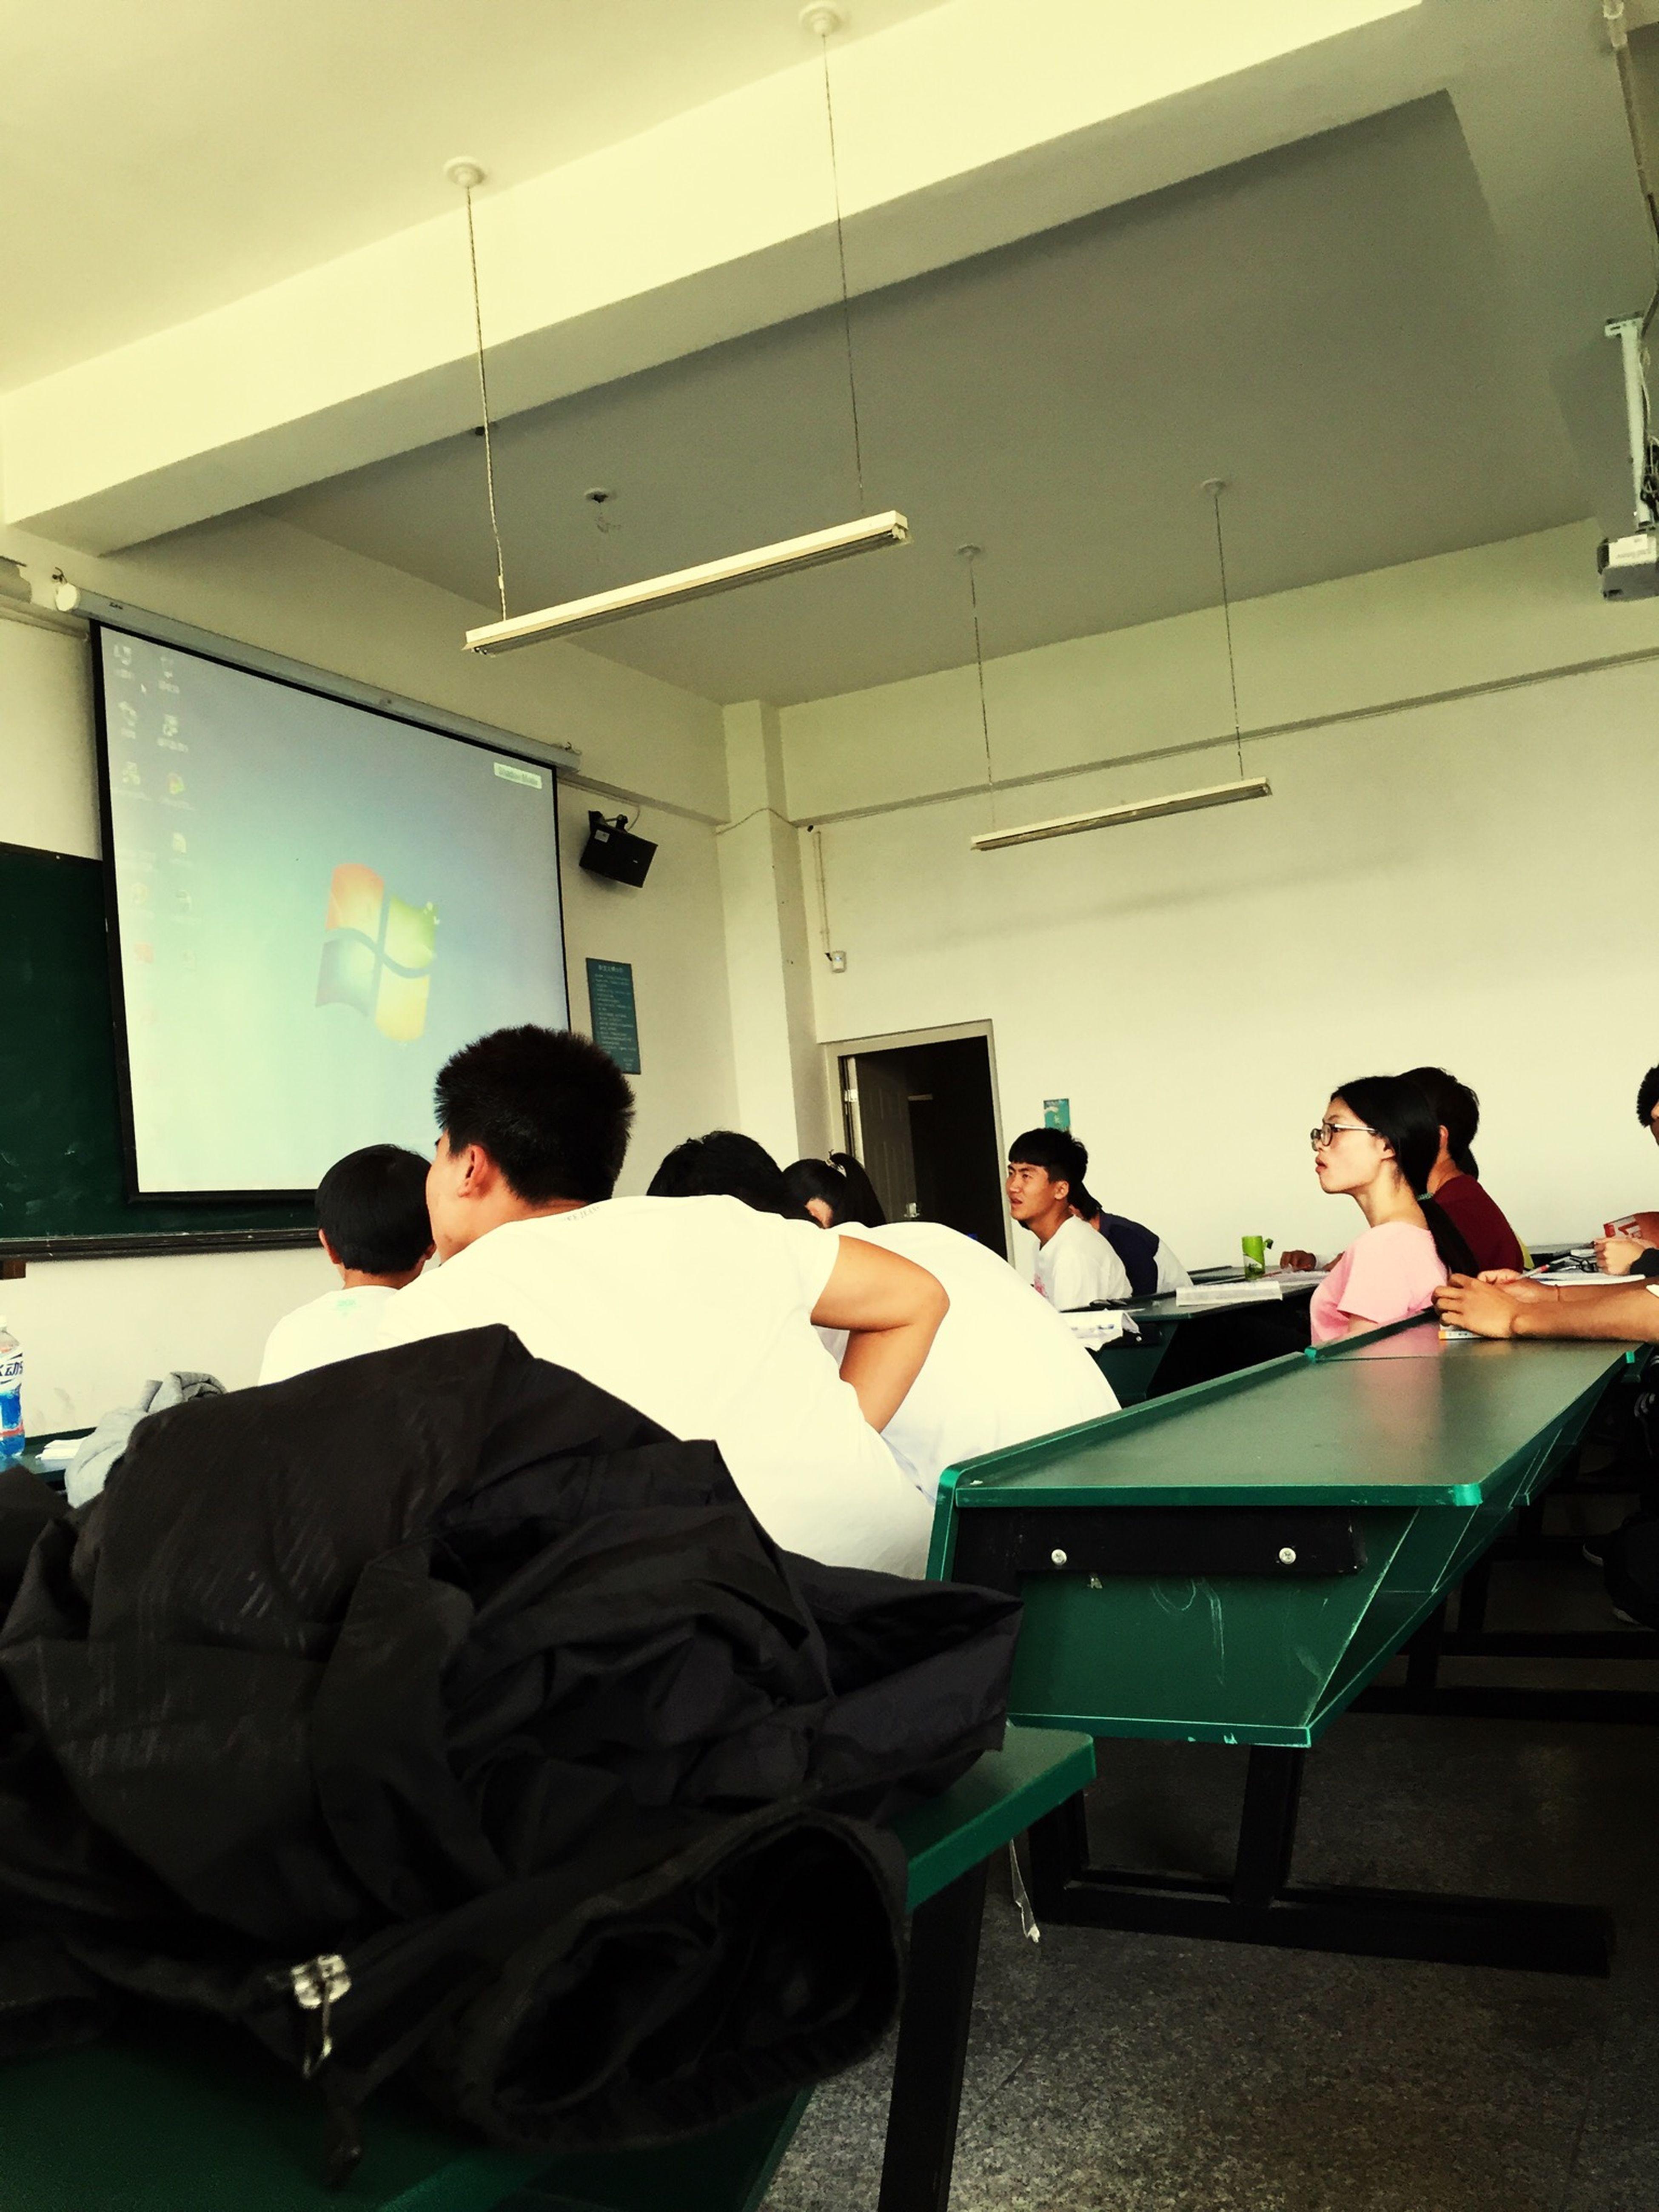 class haha